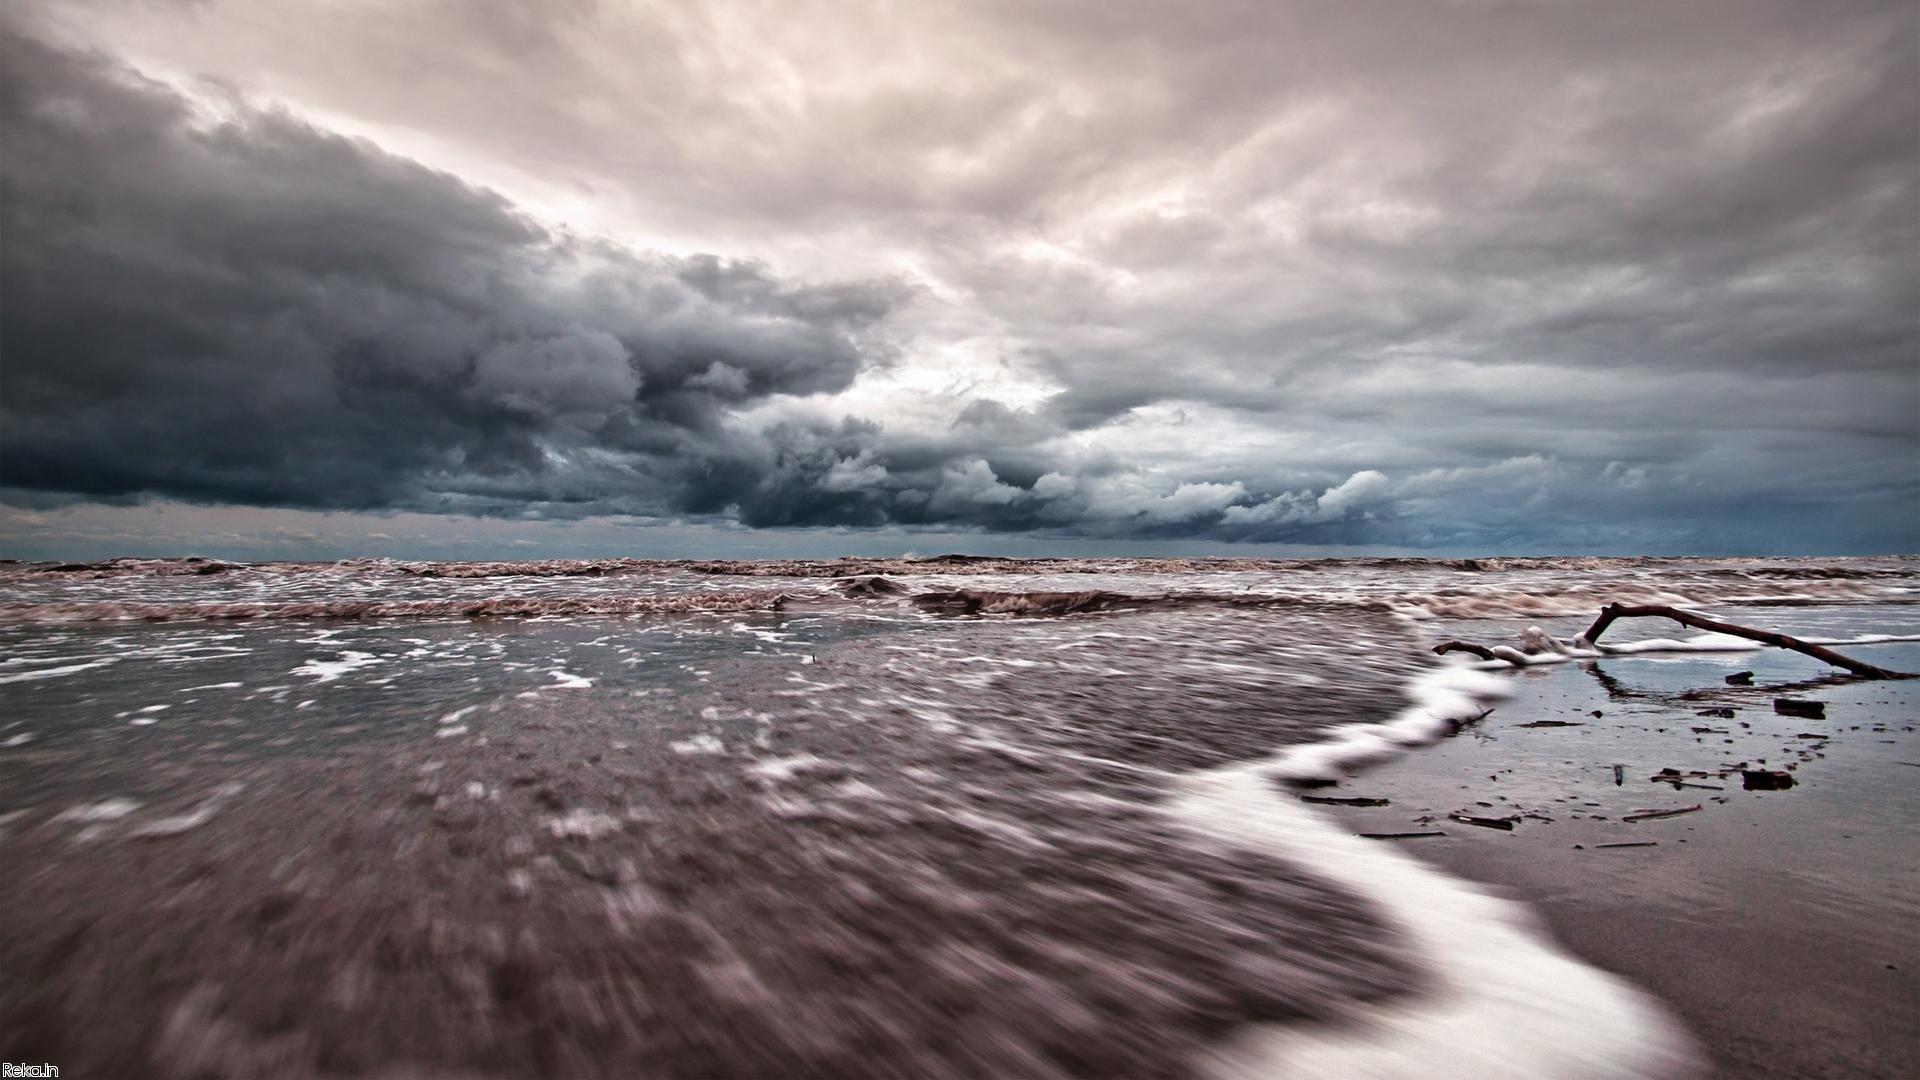 Tide Coming In Under Stormy Skies Hd Wallpaper | Wallpaper List